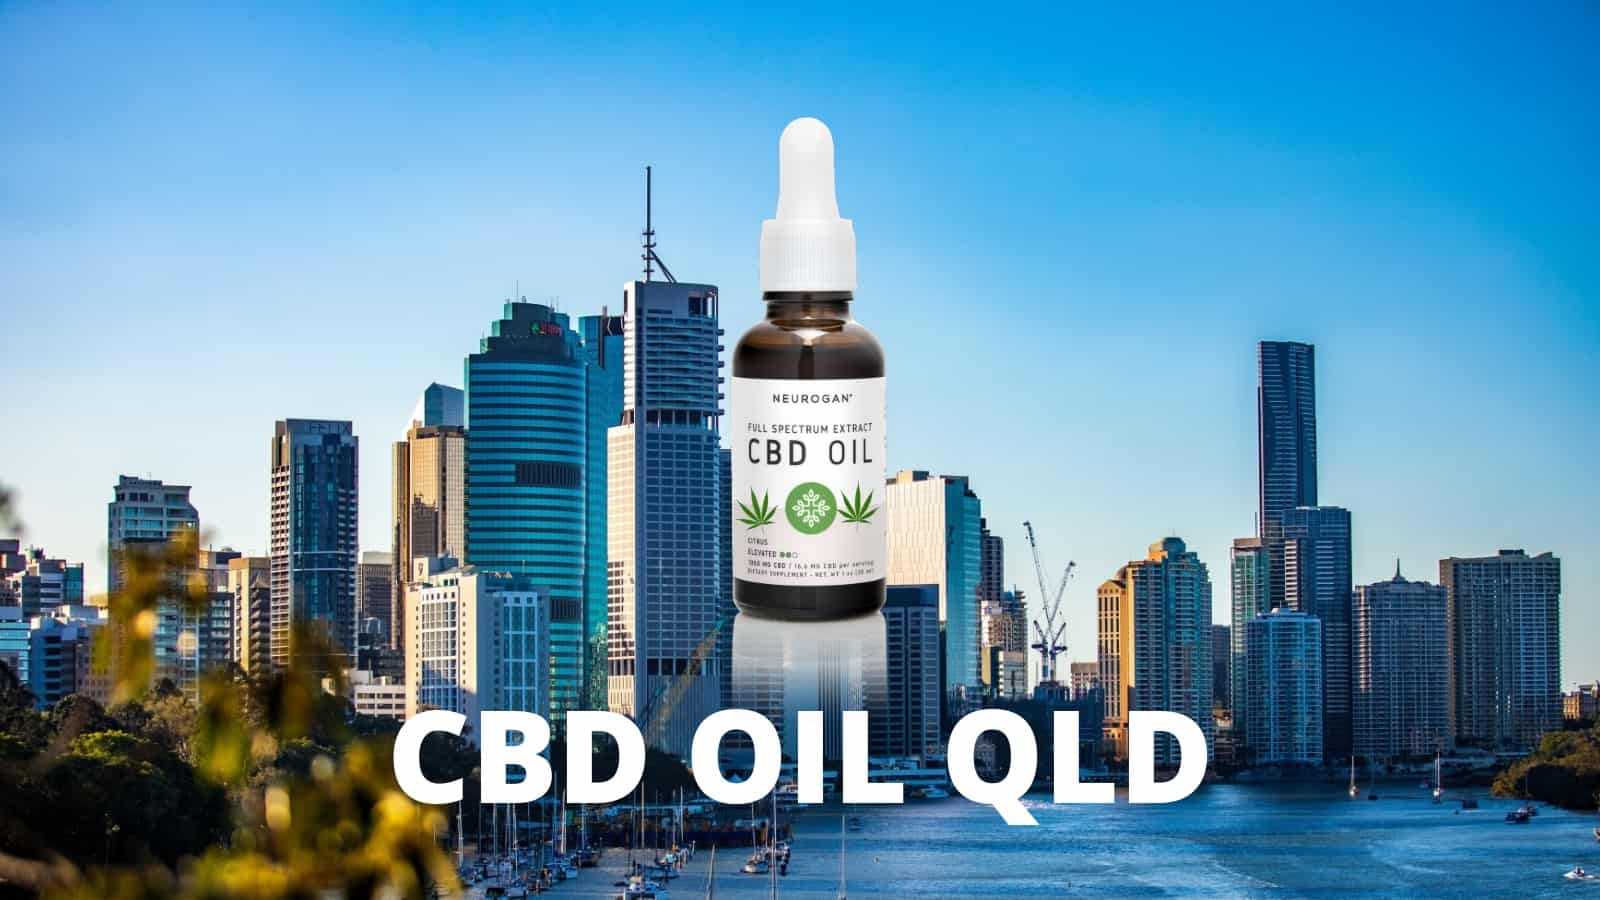 Is CBD Oil Legal in QLD?